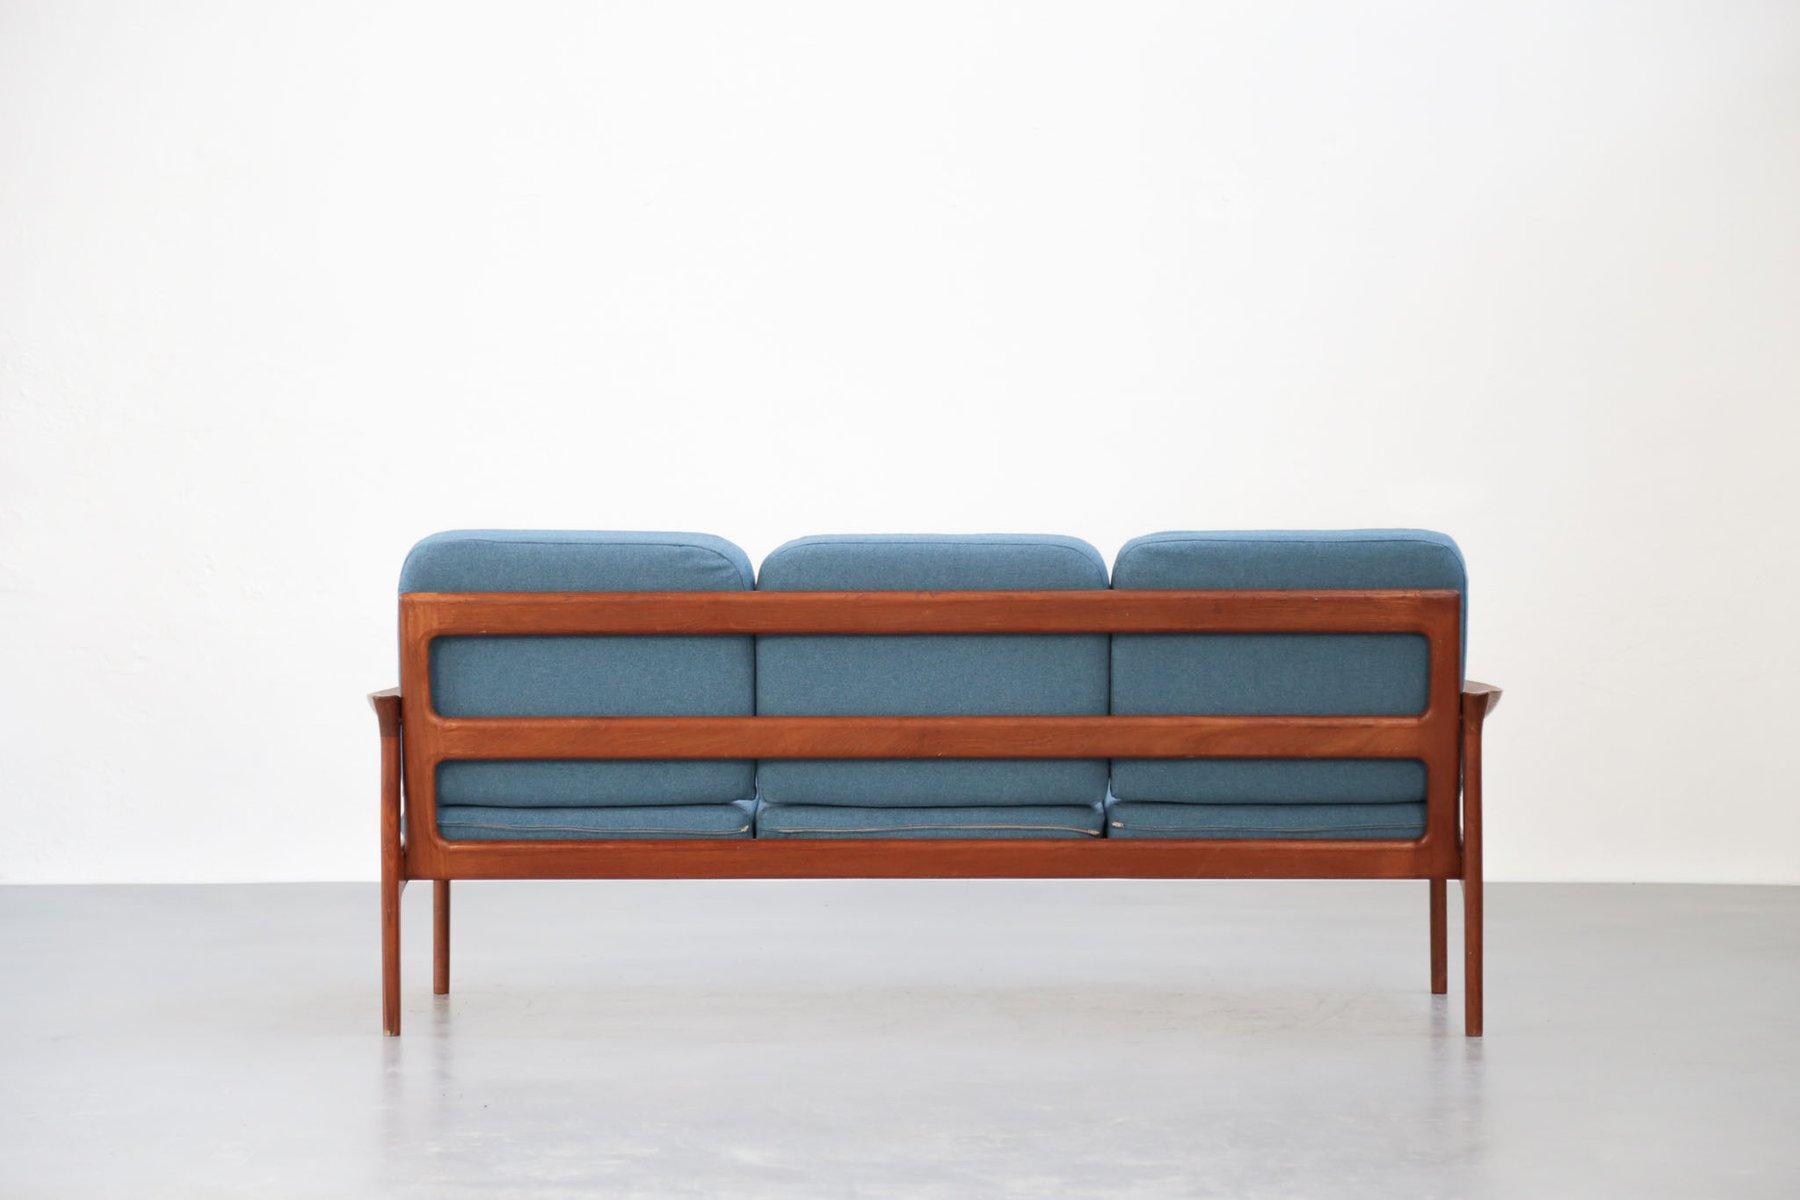 canap en teck tissu bleu danemark 1960s en vente sur pamono. Black Bedroom Furniture Sets. Home Design Ideas